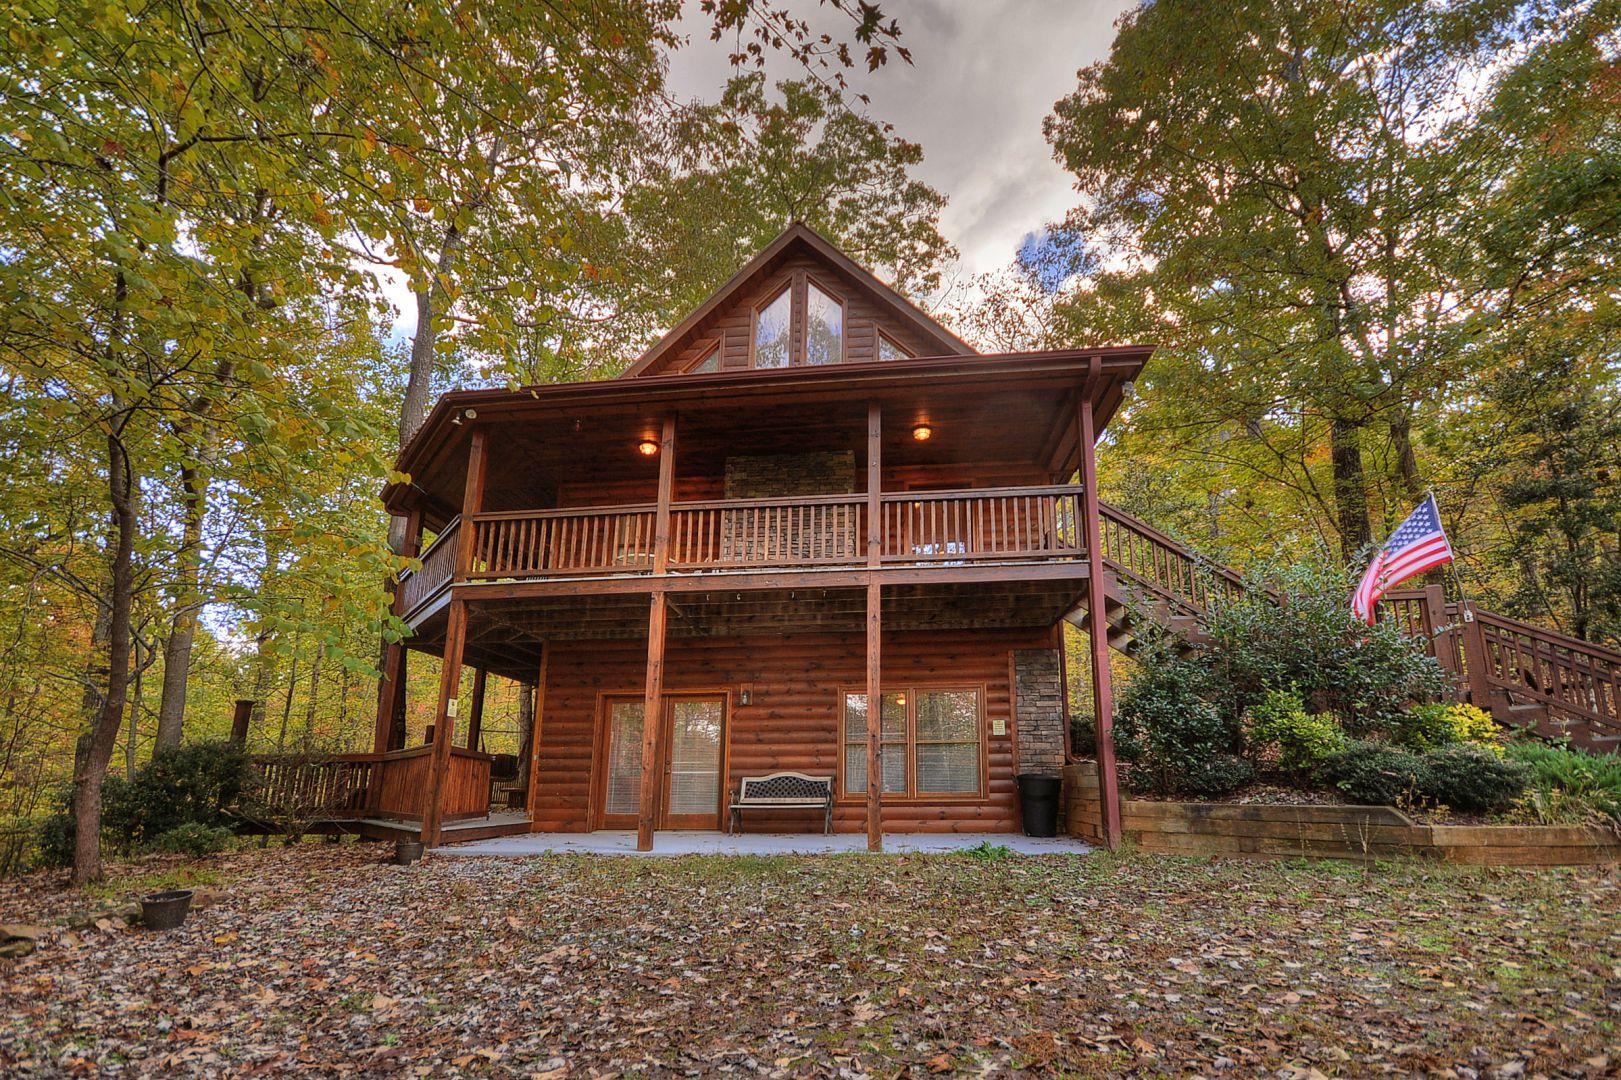 Hikers Crossing Rental Cabin | Cuddle Up Cabin Rentals